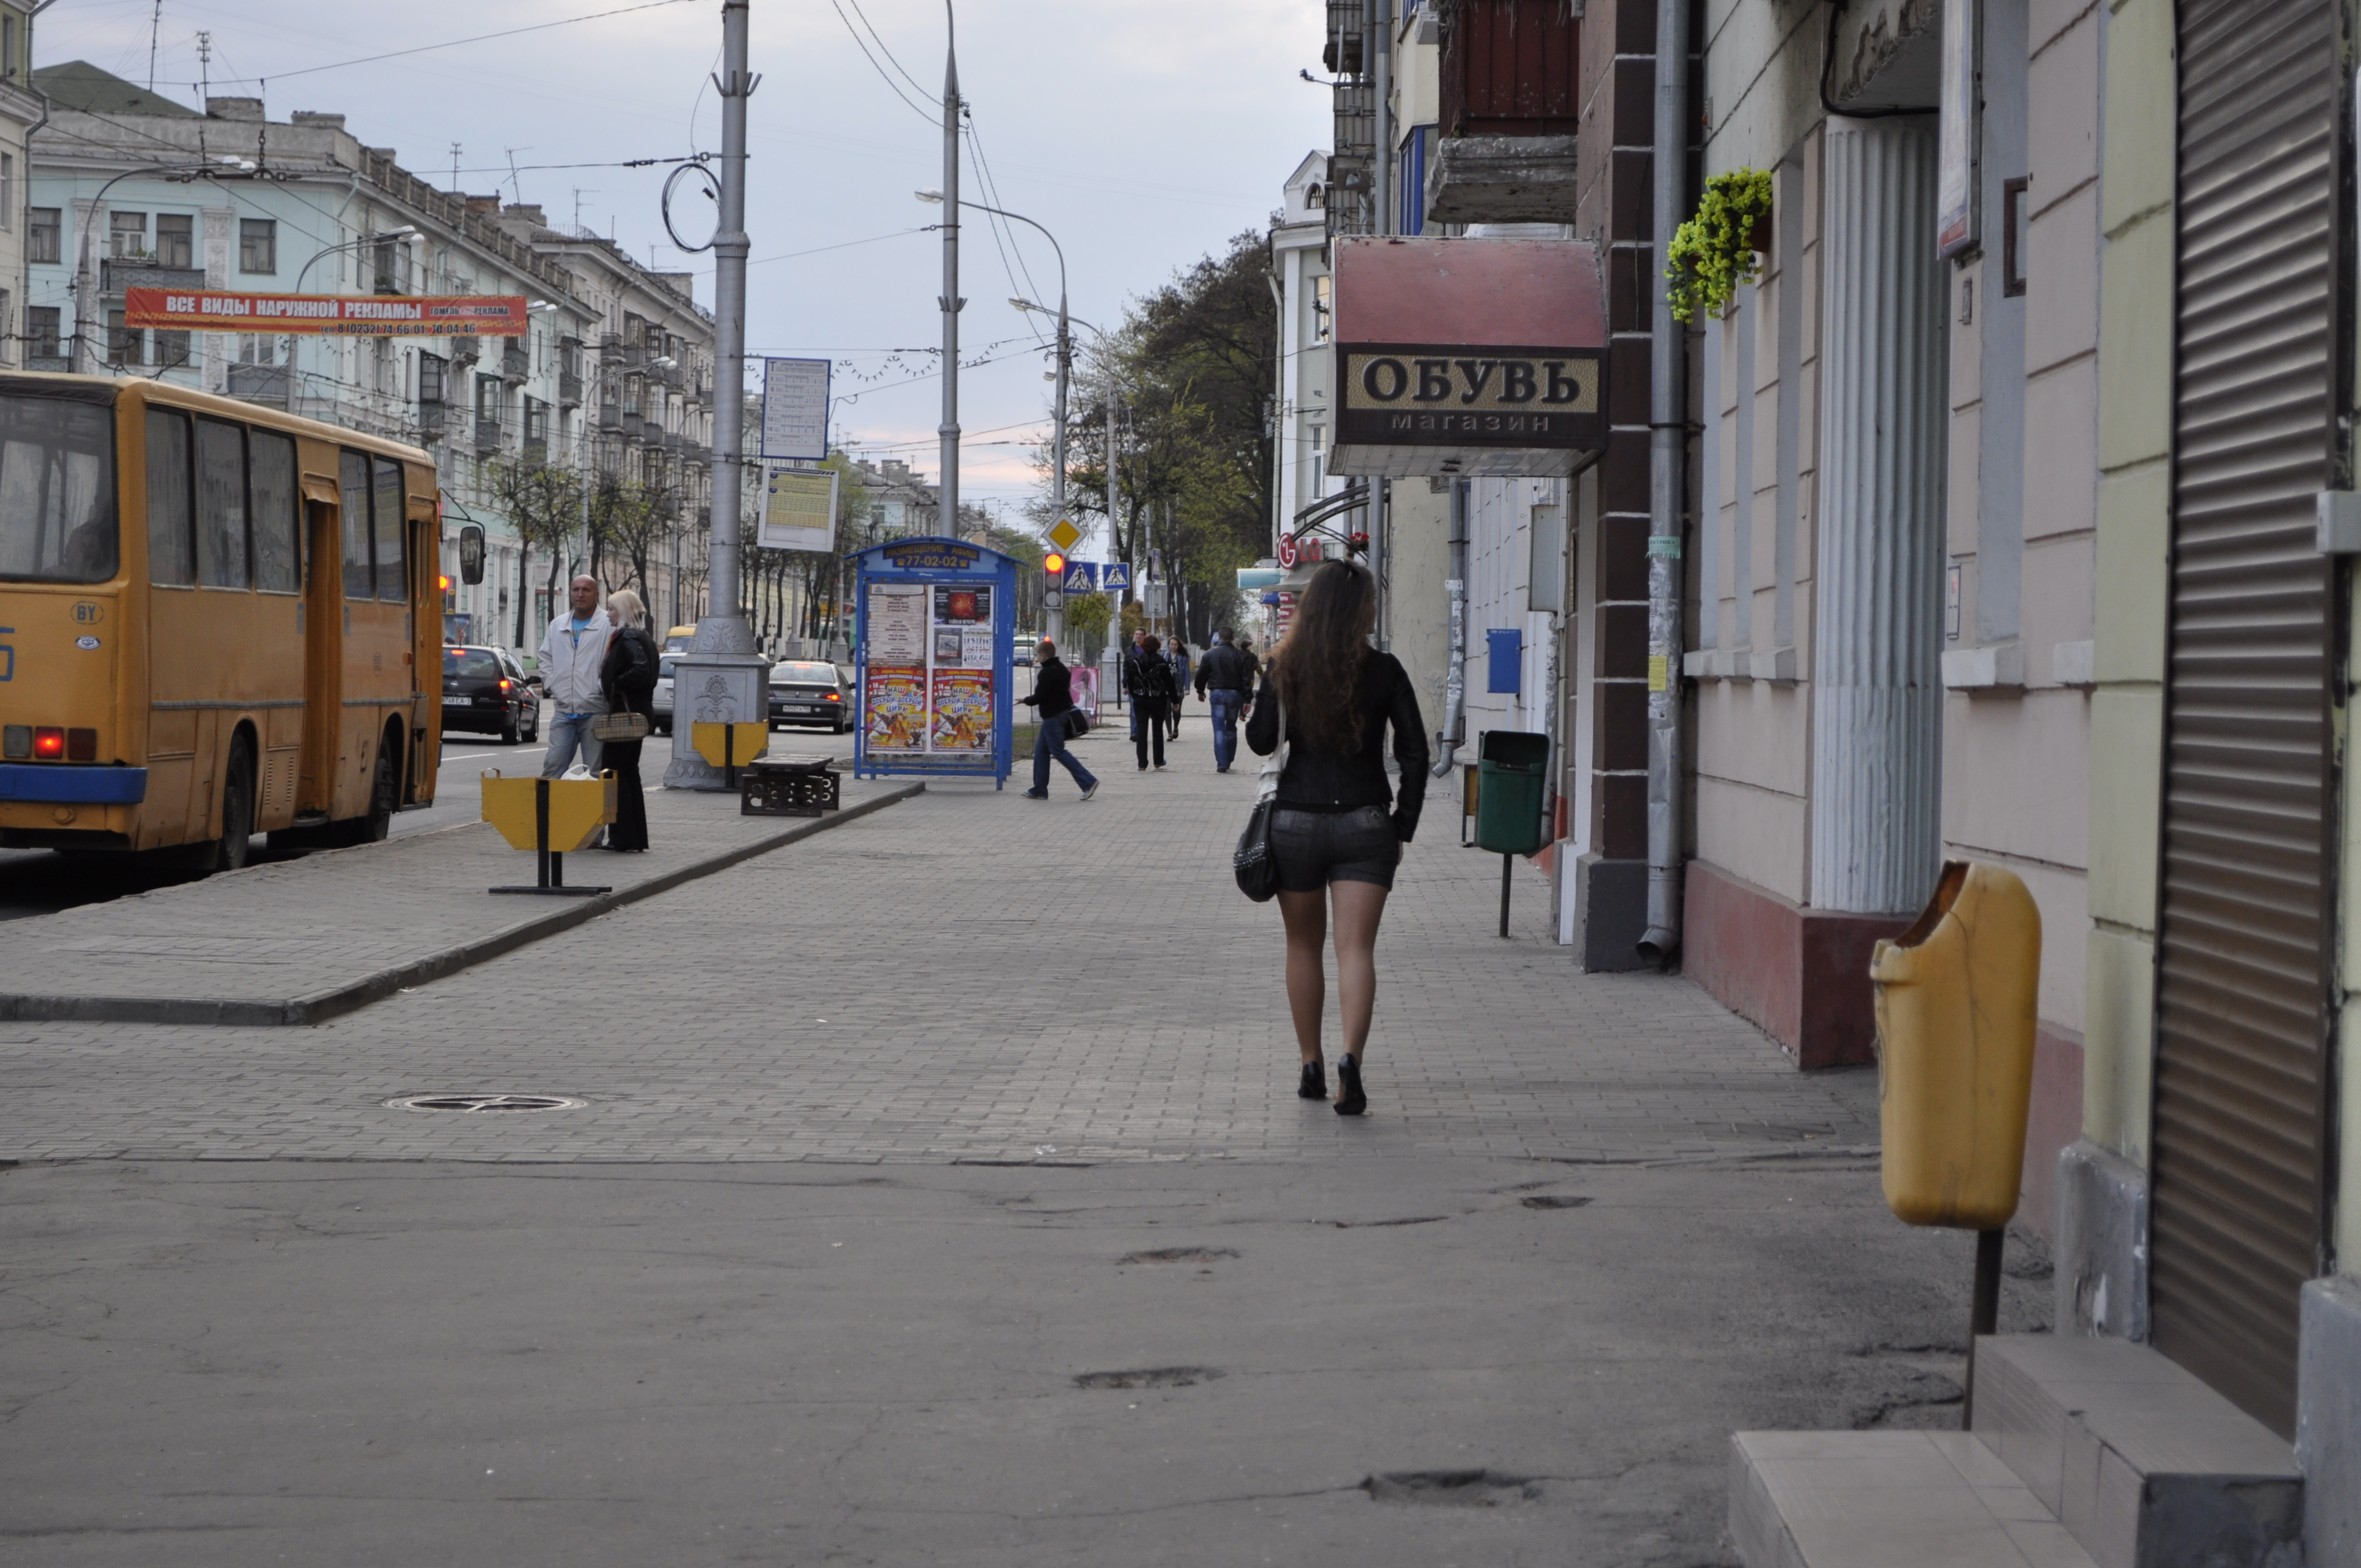 City street, City, Sidewalk, Street, Walking, HQ Photo